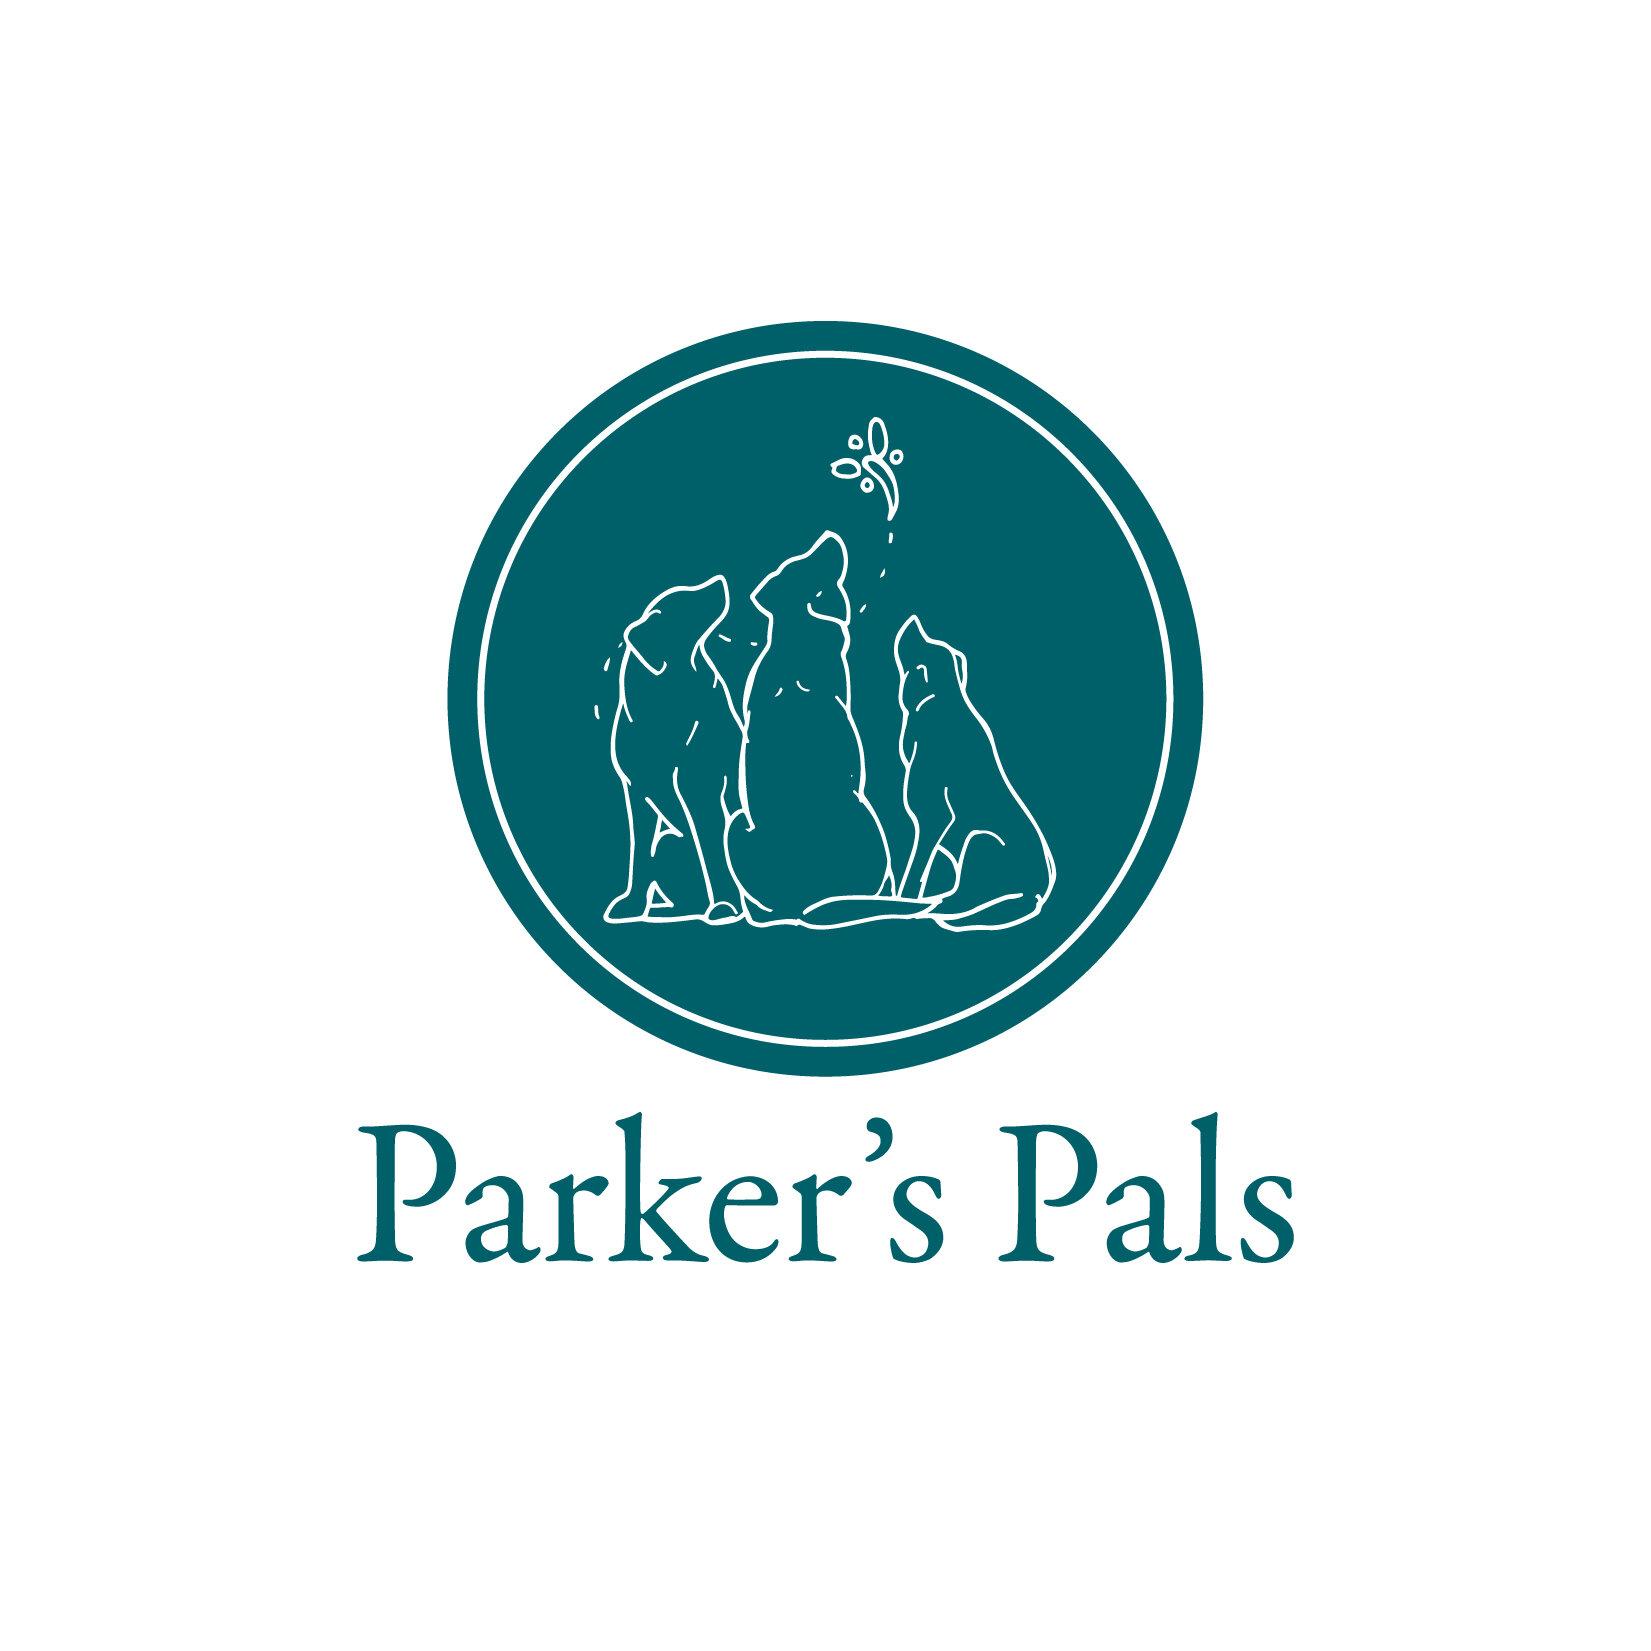 ParkersPals_Logo1-02.jpg